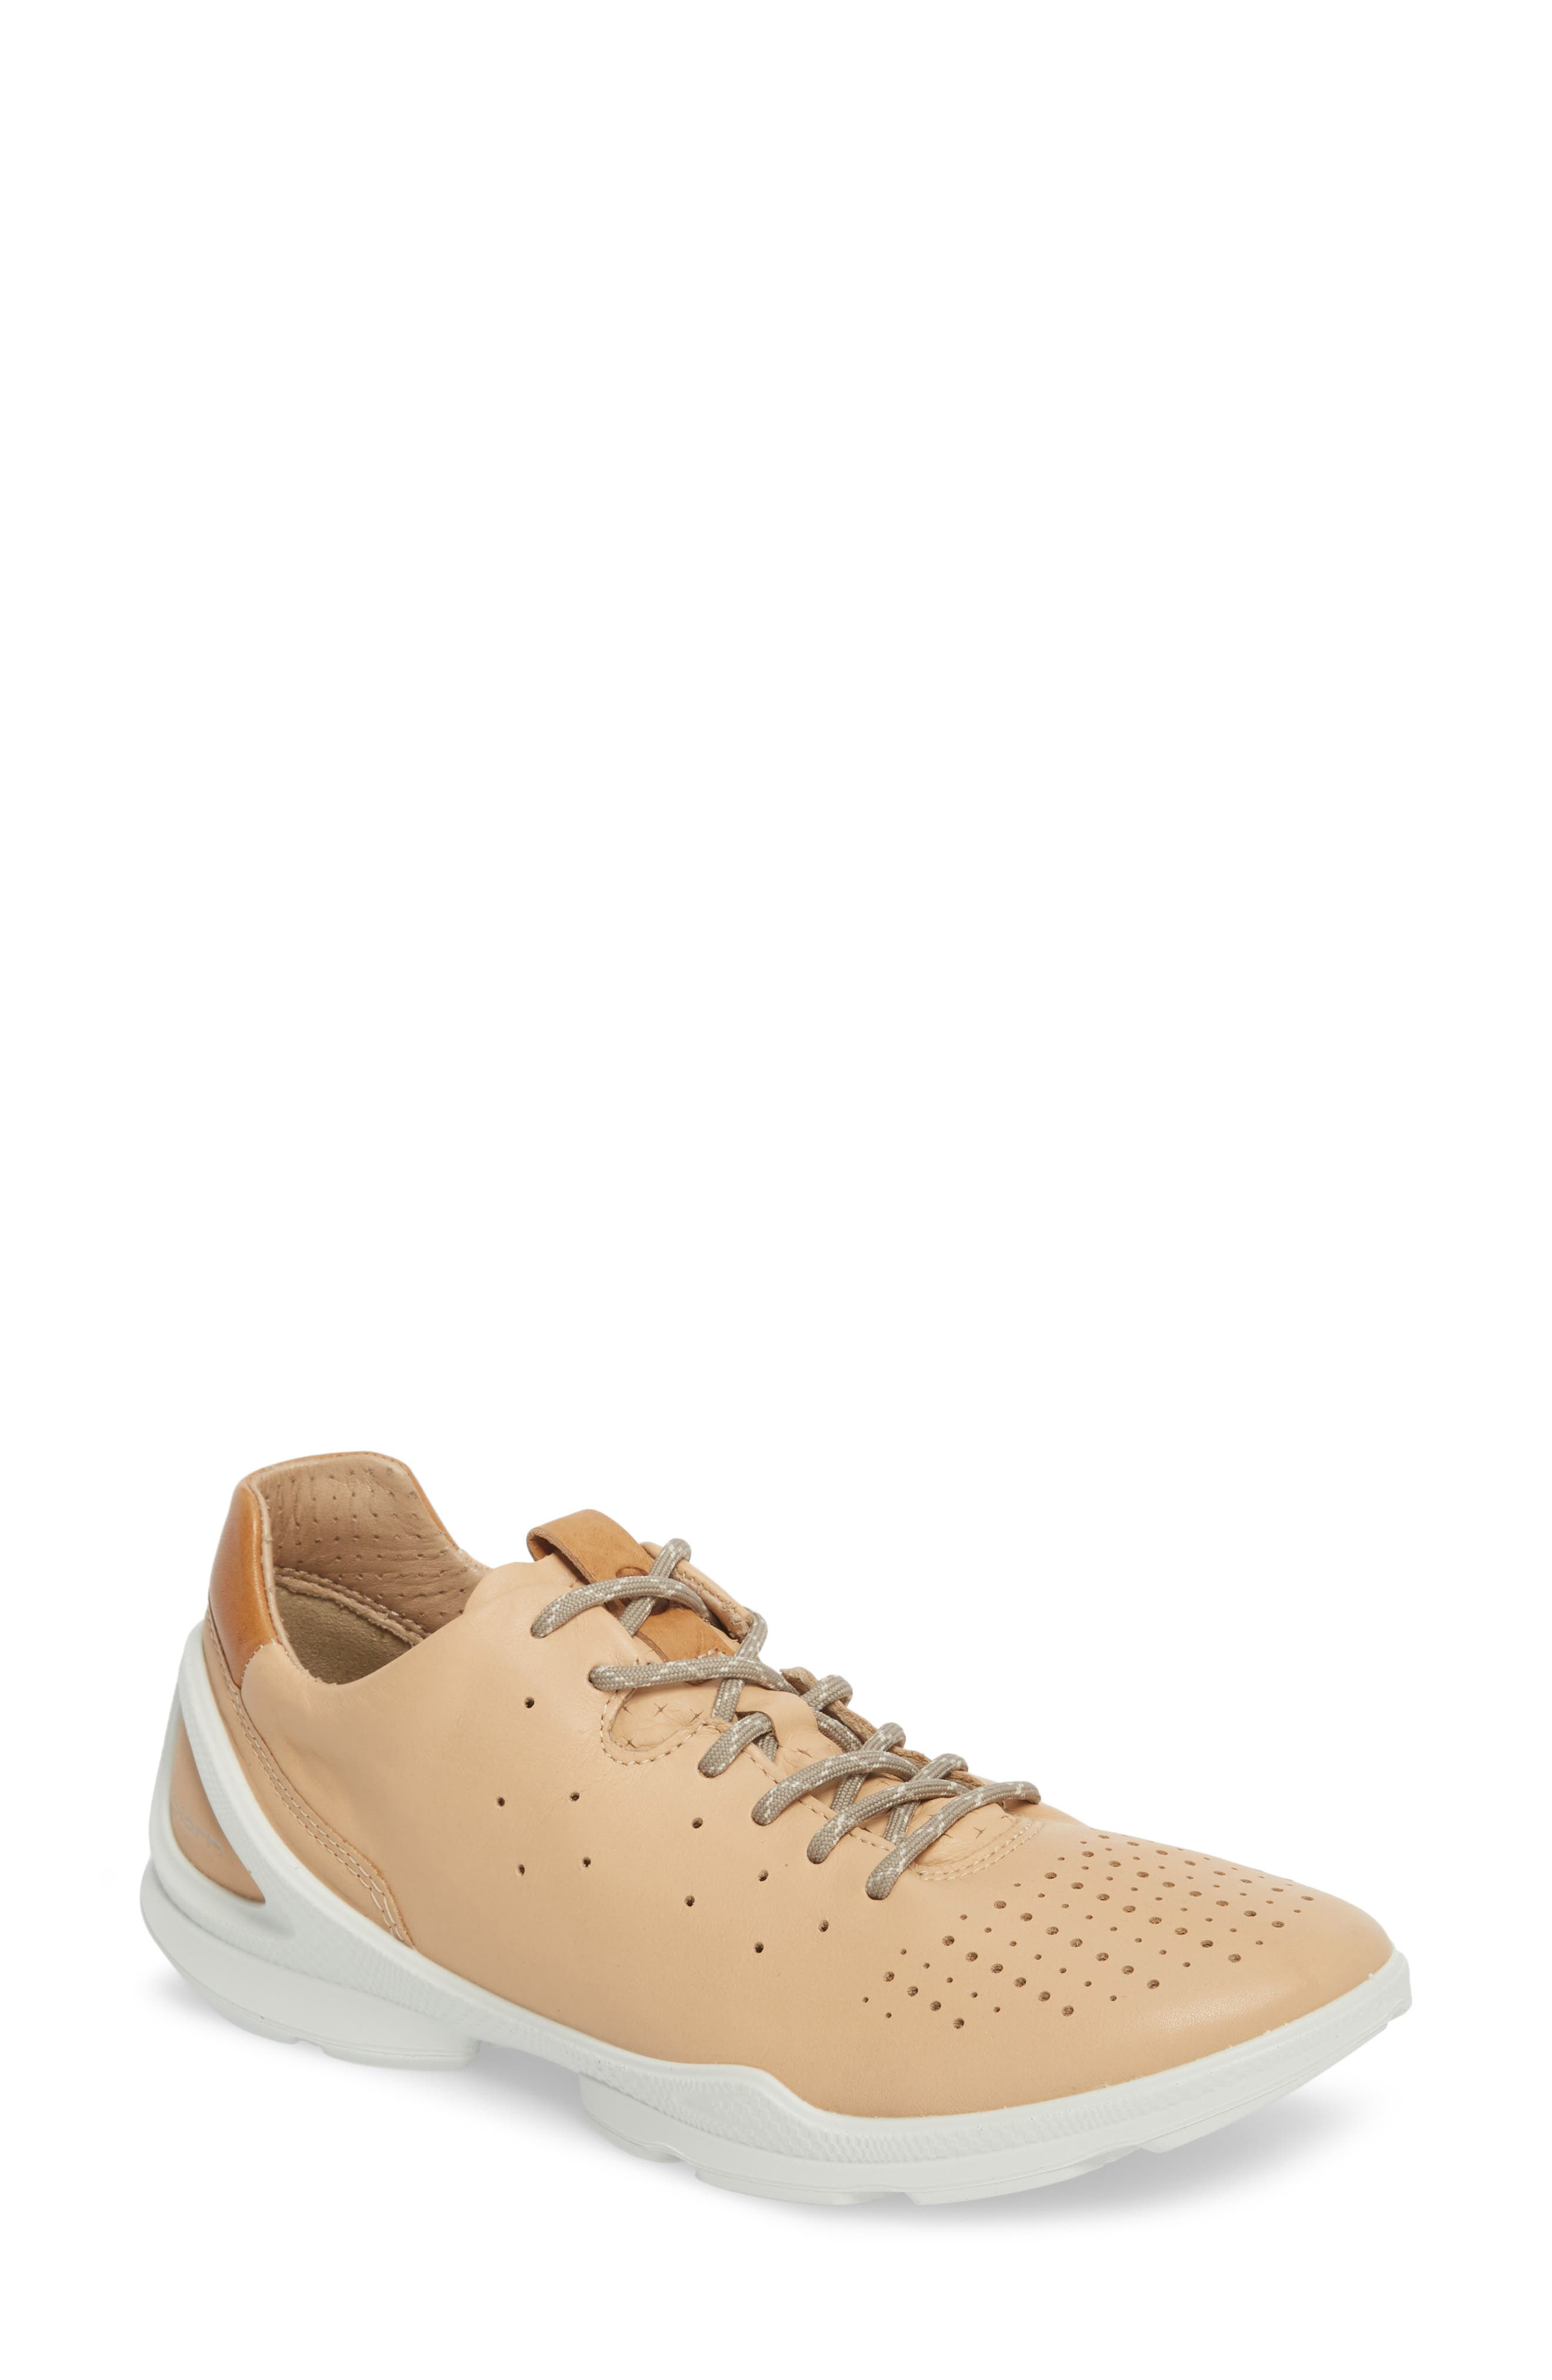 Biom Street Sneaker,                             Main thumbnail 1, color,